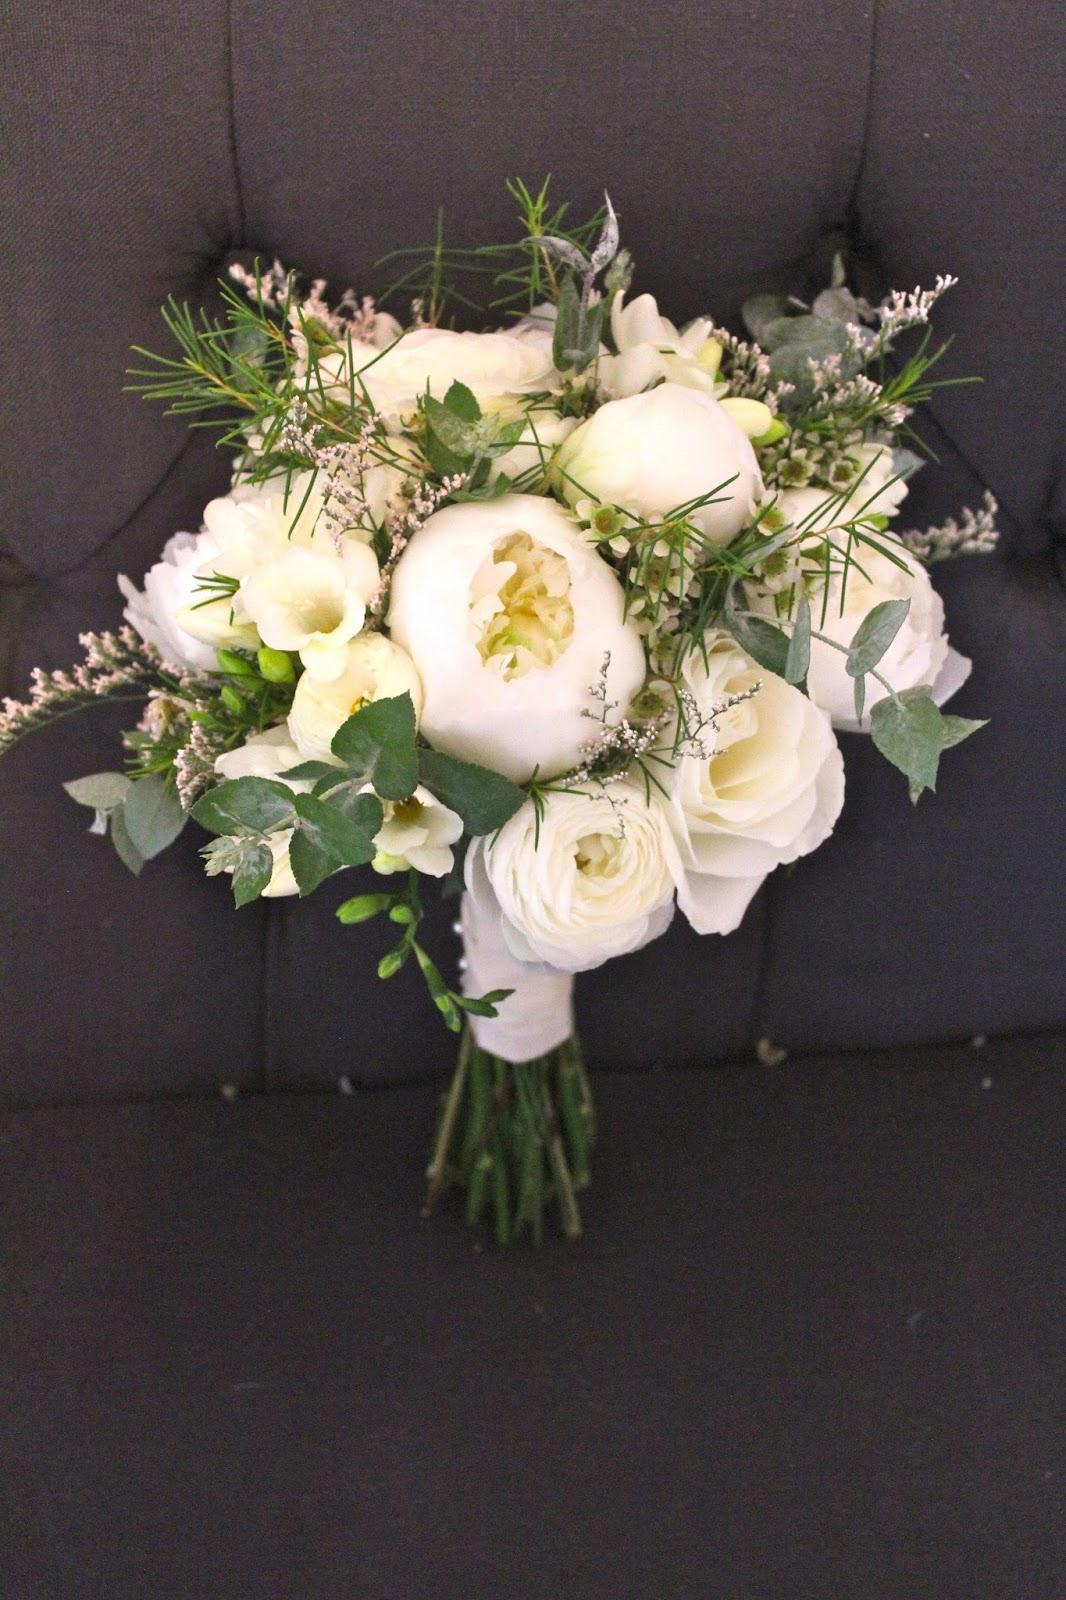 Allison Phalen Floral Design: 2013